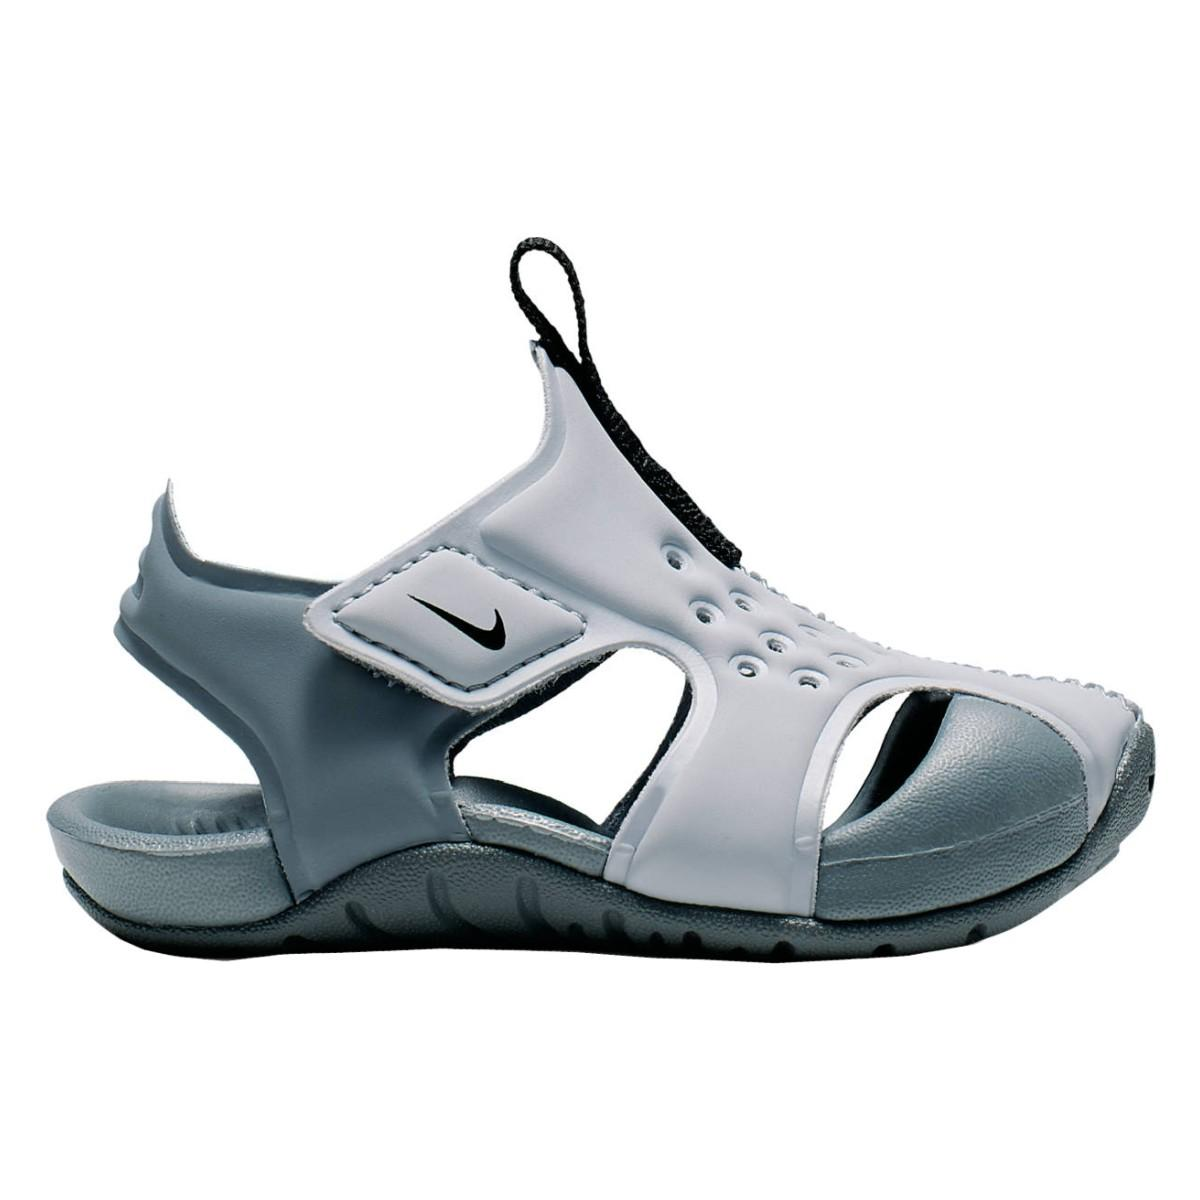 Protect Nike 2psSivi Sandali Sunray 27 Vel Nwmyv0P8nO